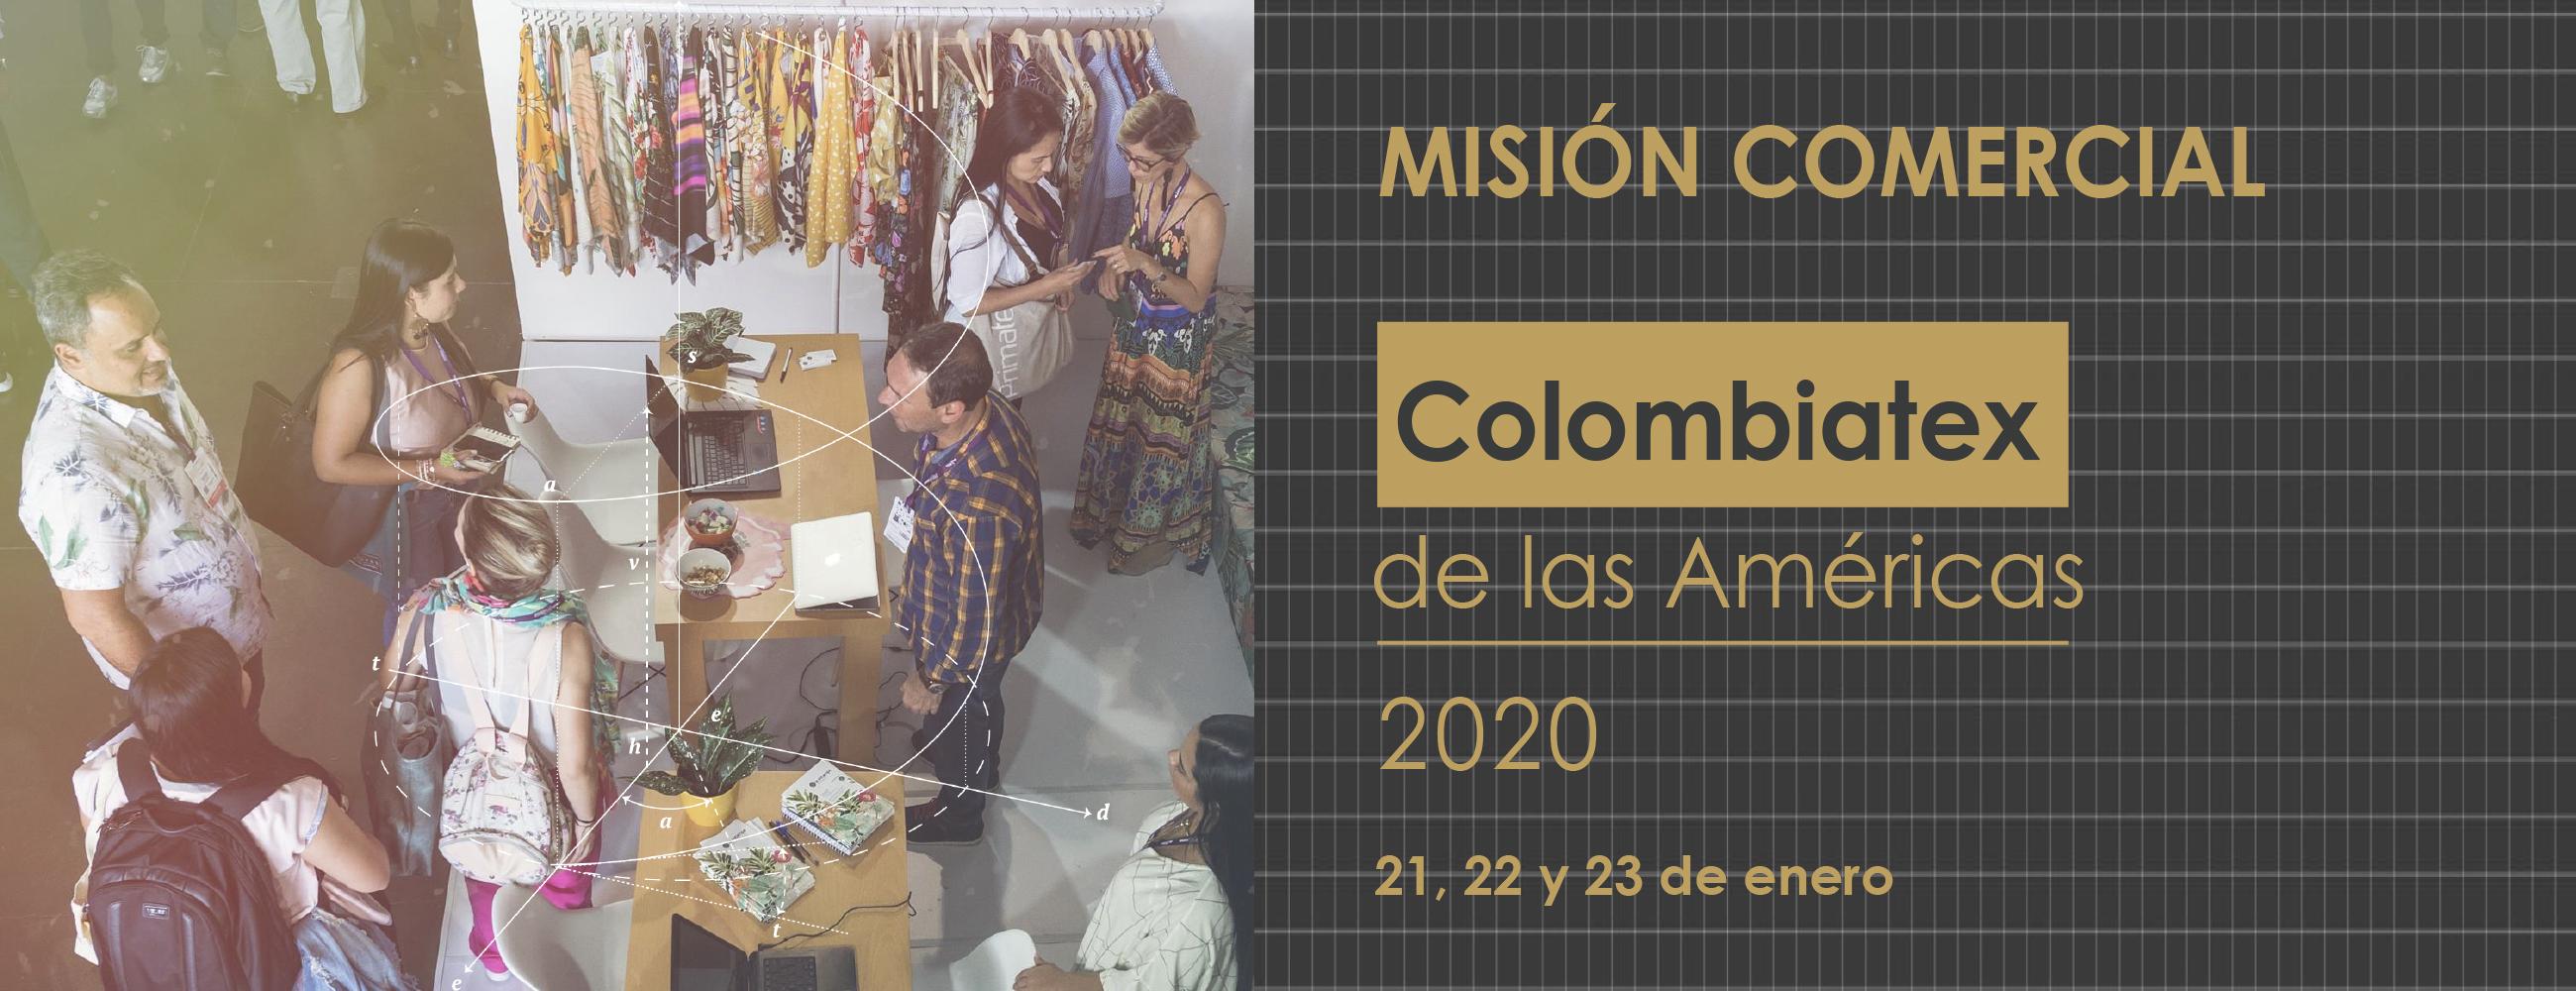 Link Colombiatex